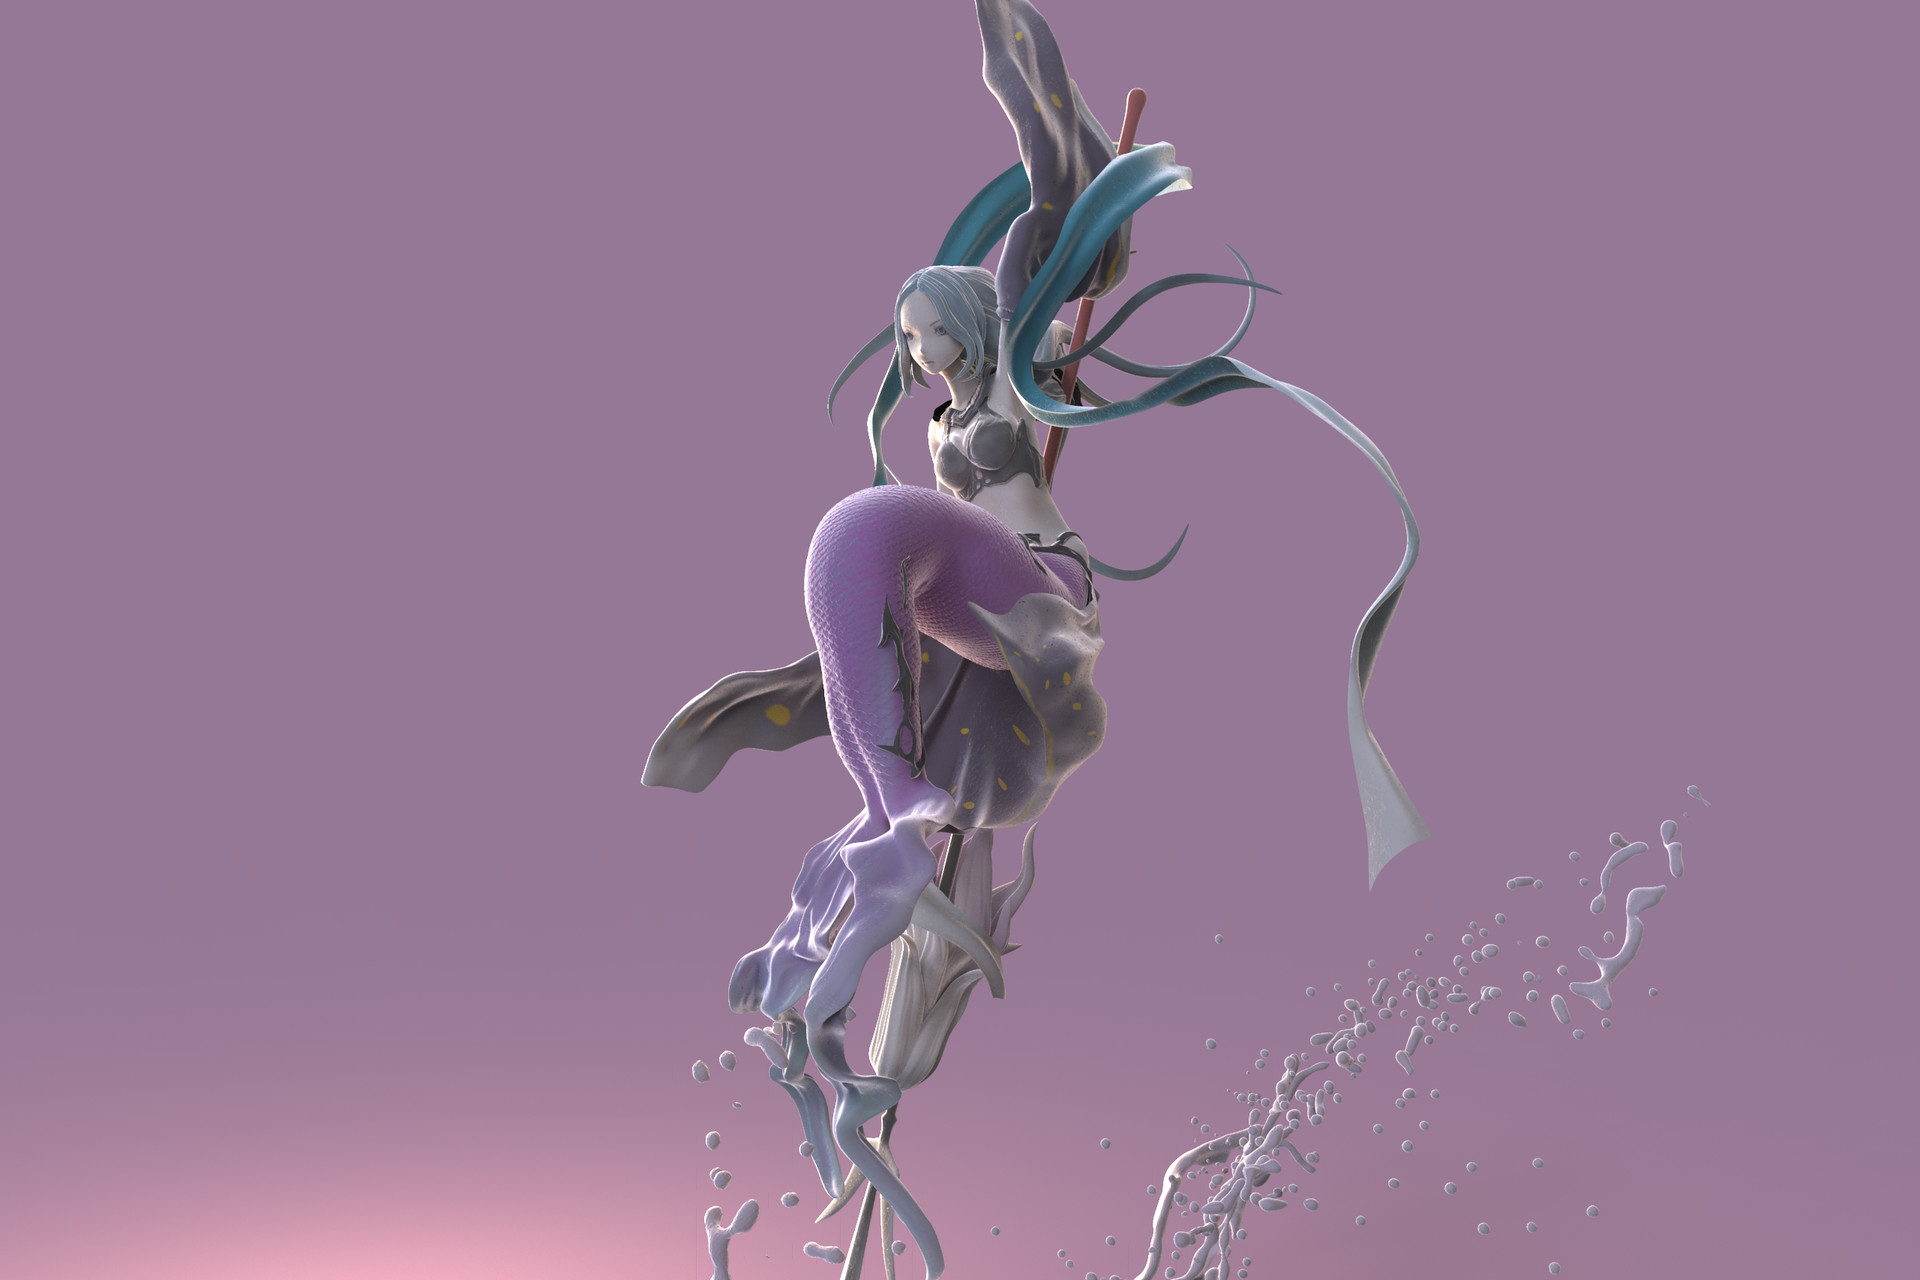 Masatomo suzuki mermaid05